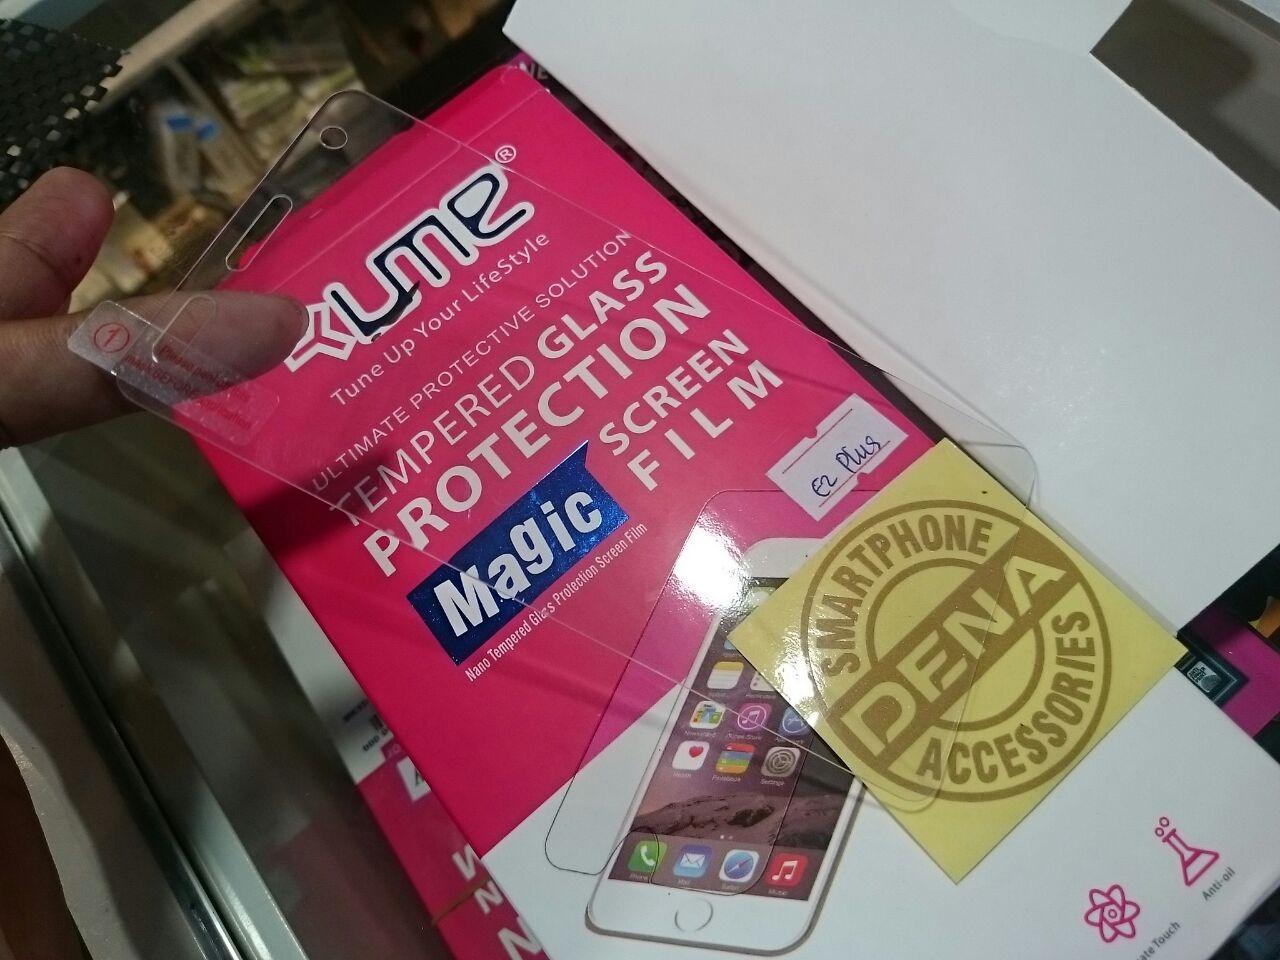 Jual Tempered Glass Andromax E2 Plus Dena Acc Surabaya Tokopedia R2 Titan Premium 25d Clear